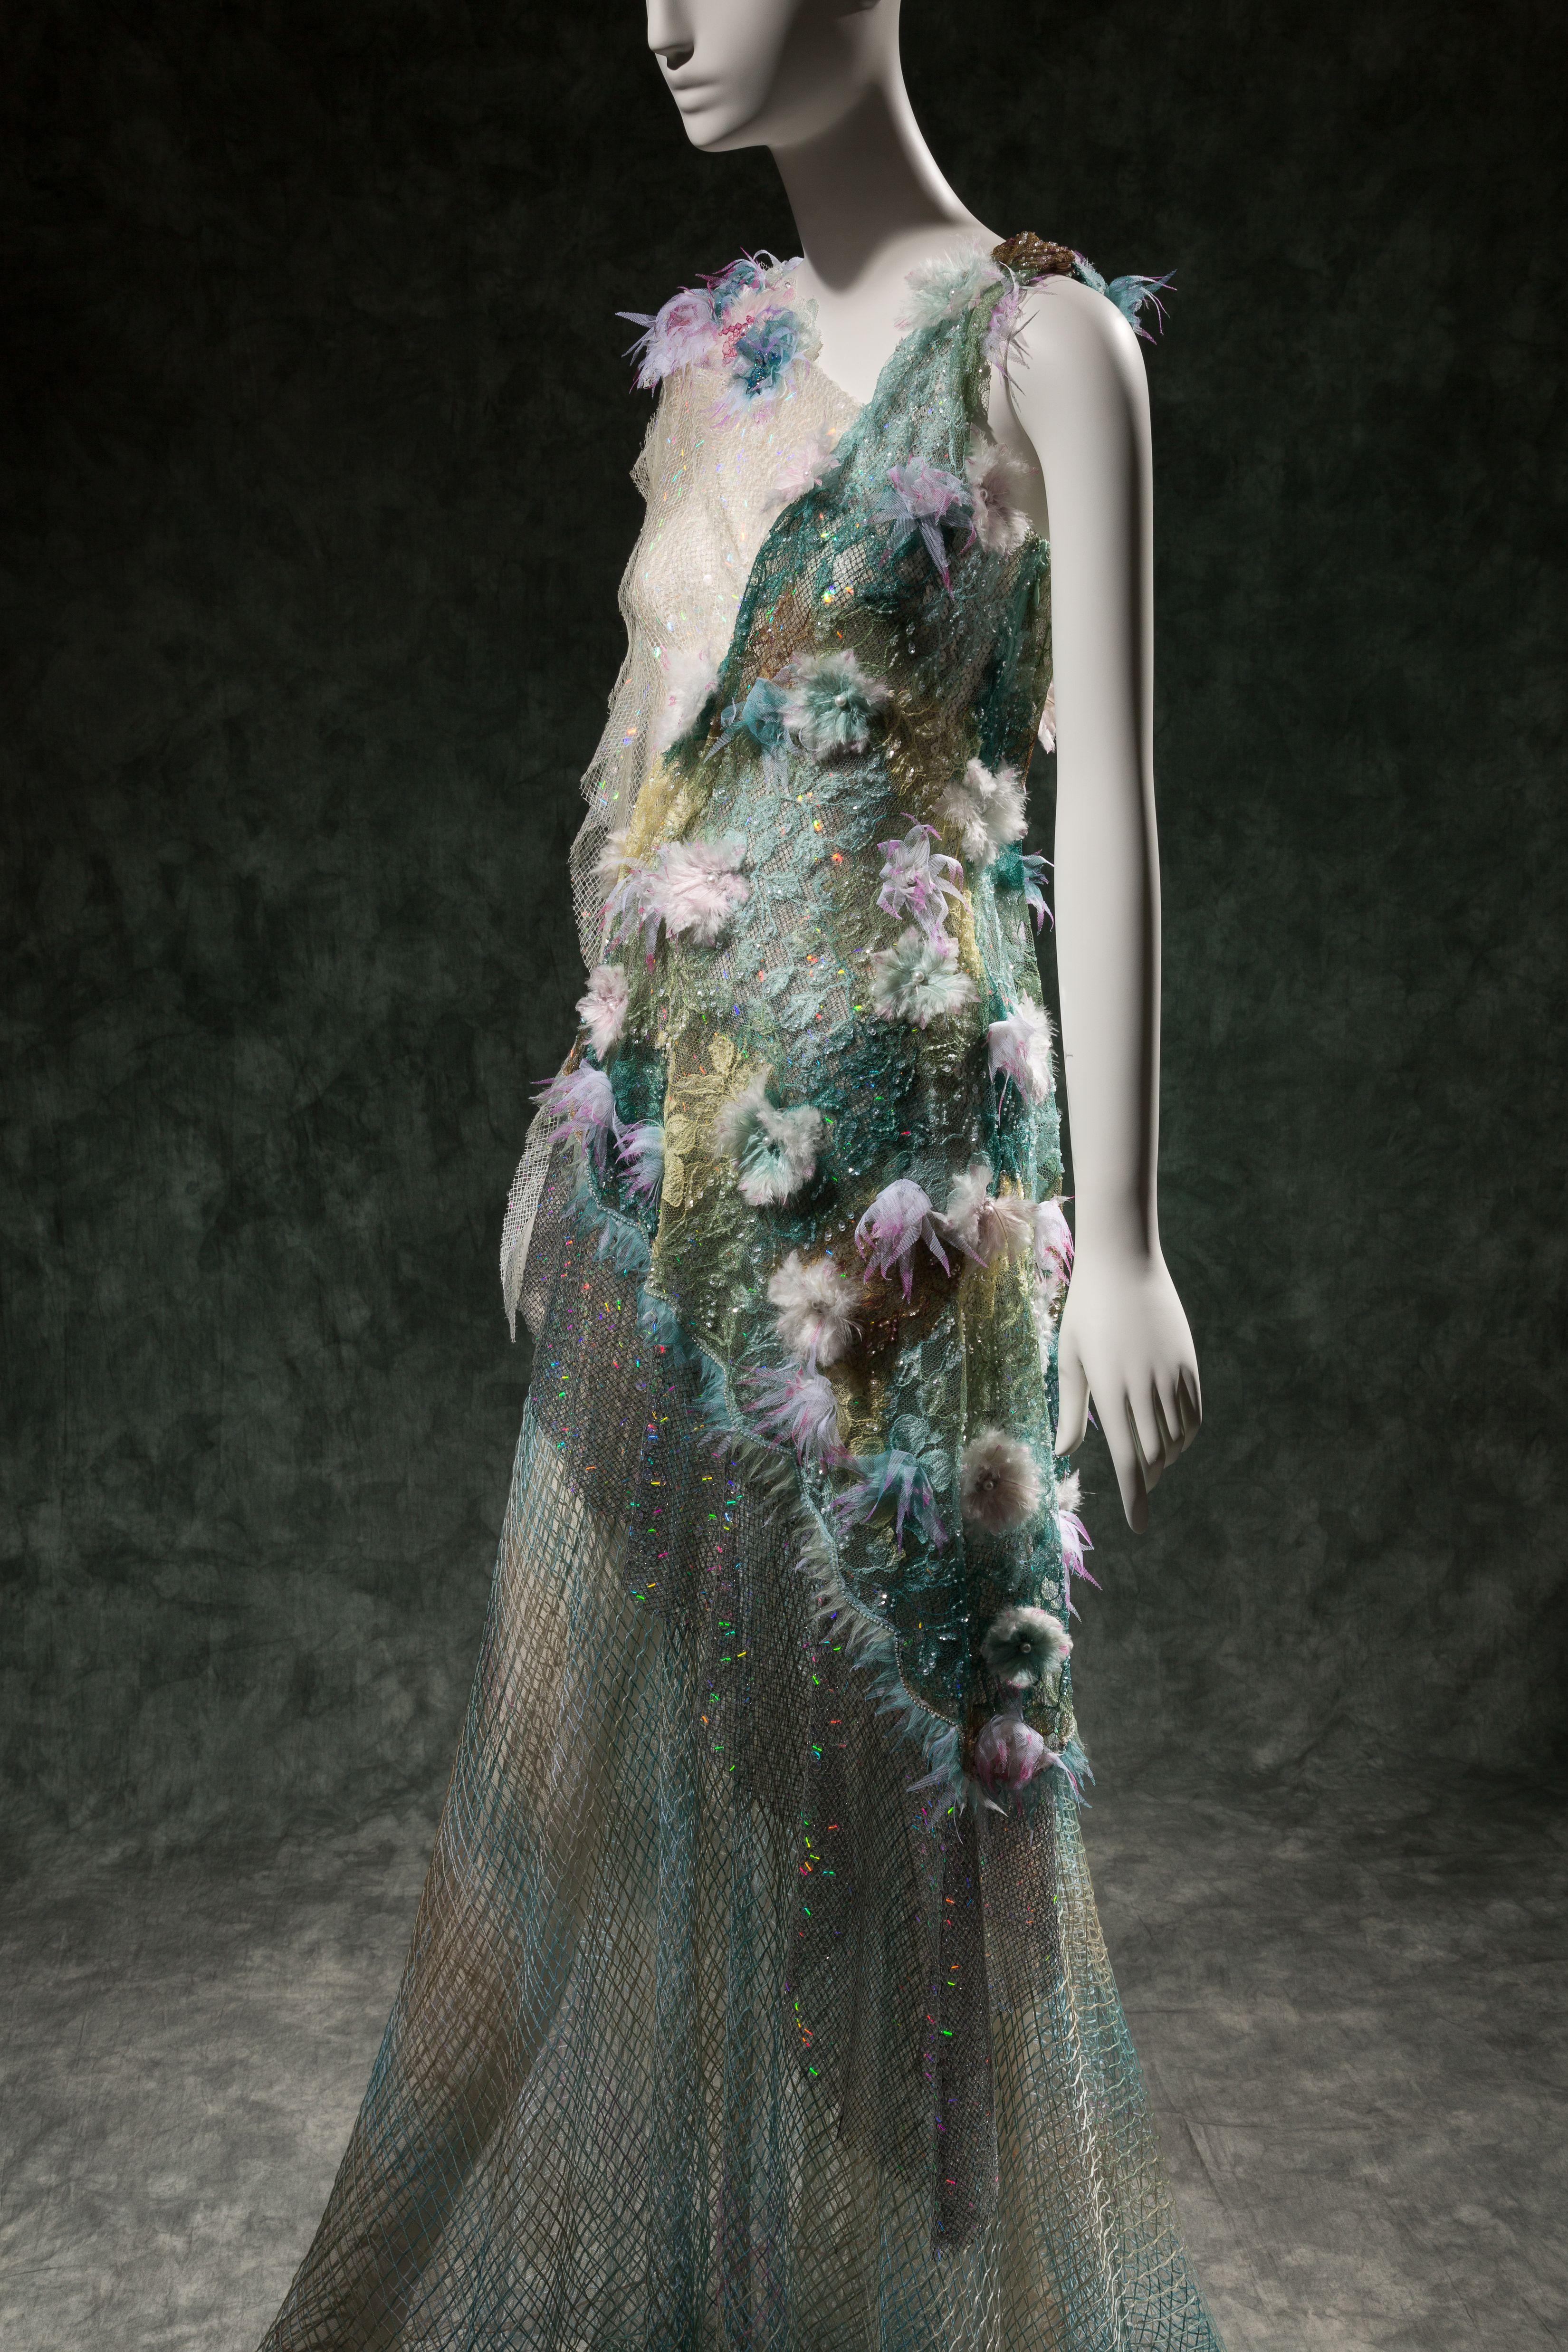 "Rodarte, dress, spring 2015, USA. The Museum at FIT, 2015.35.1, photograph © The Museum at FIT (illustrating ""The Little Mermaid"")"